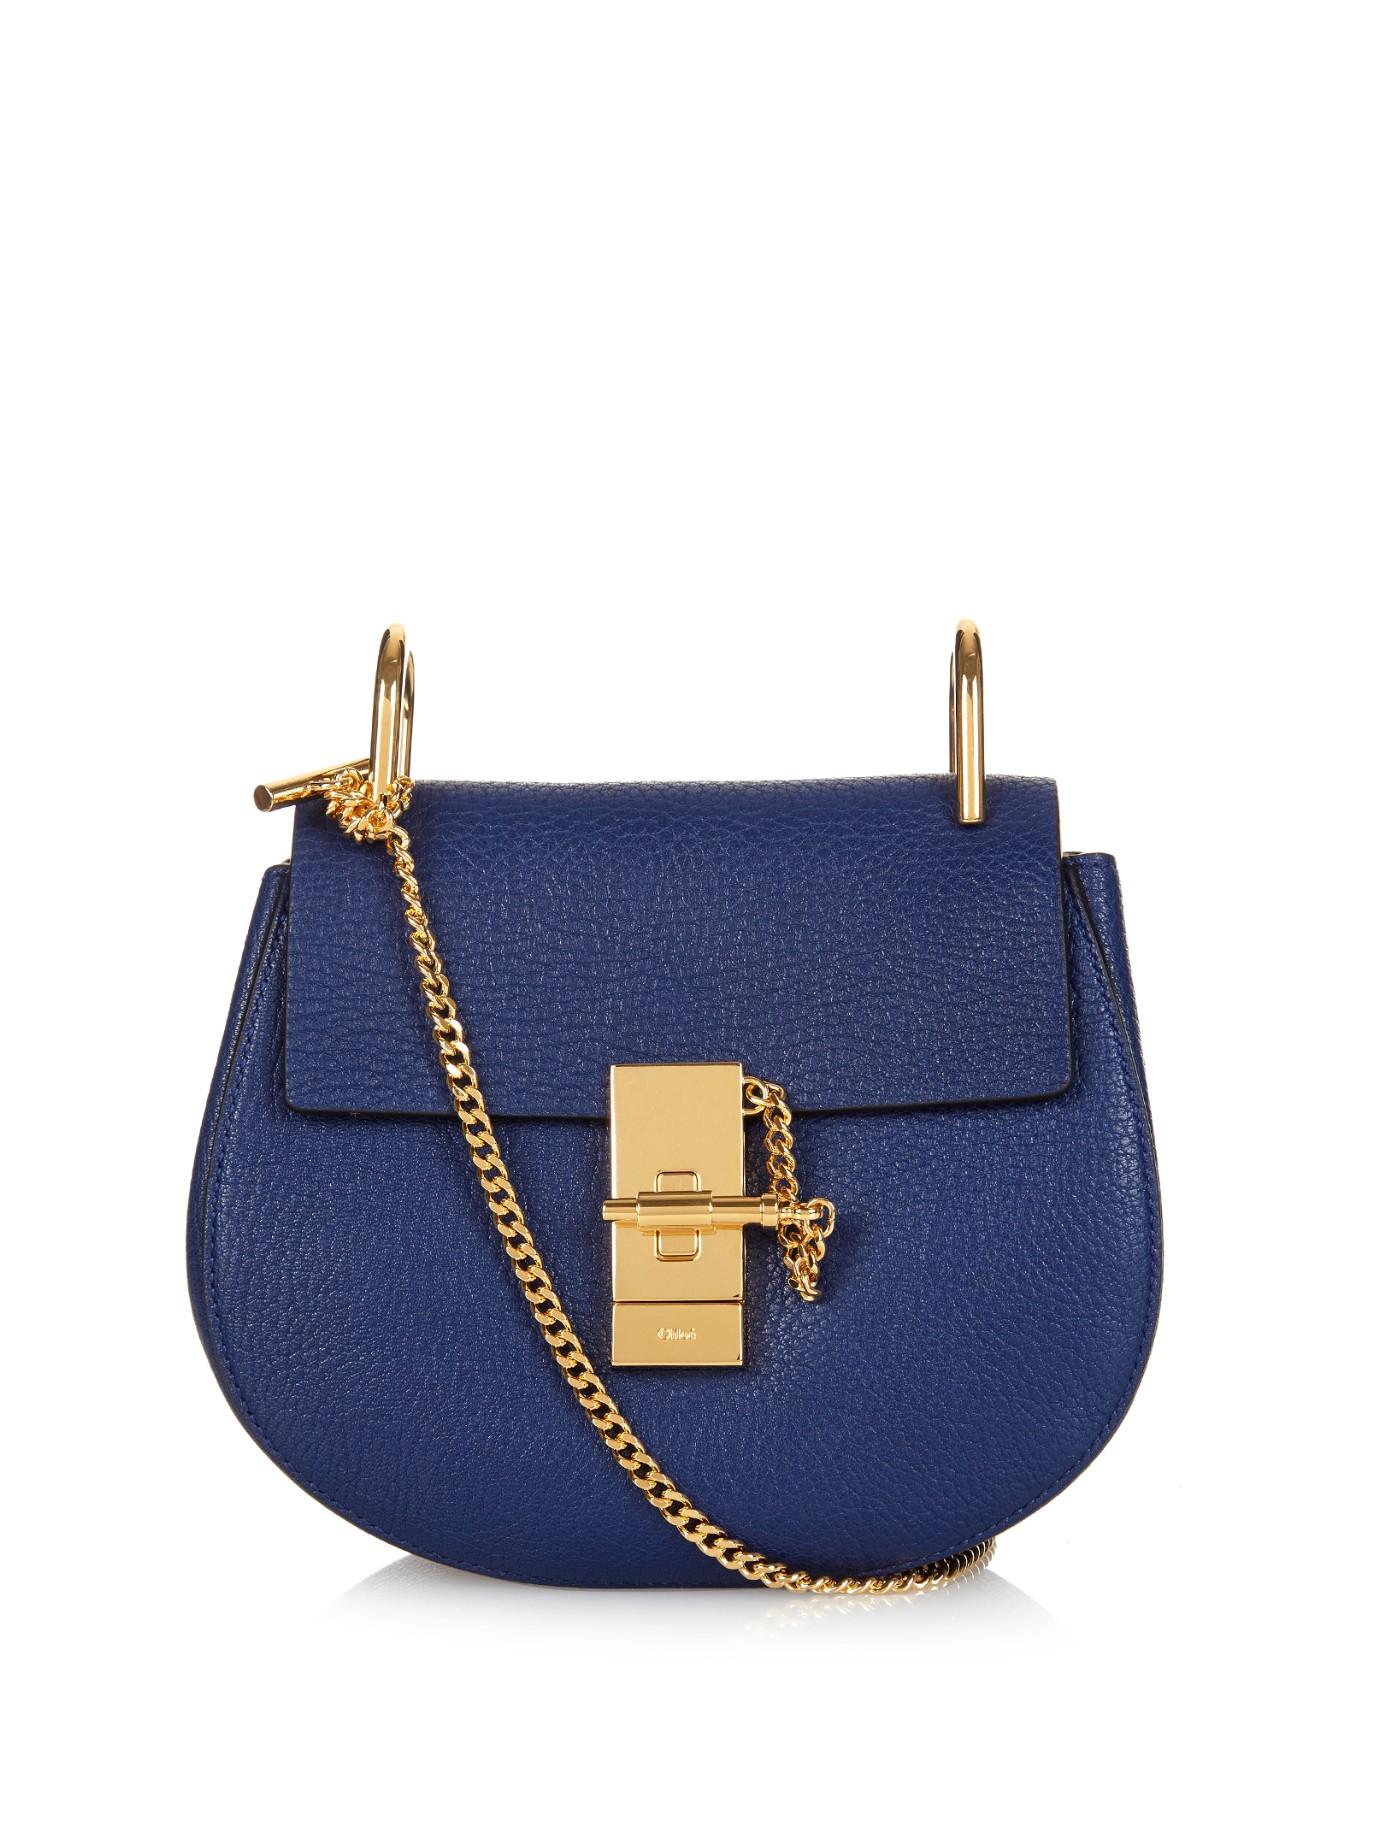 chlo drew mini leather cross body bag in blue lyst. Black Bedroom Furniture Sets. Home Design Ideas